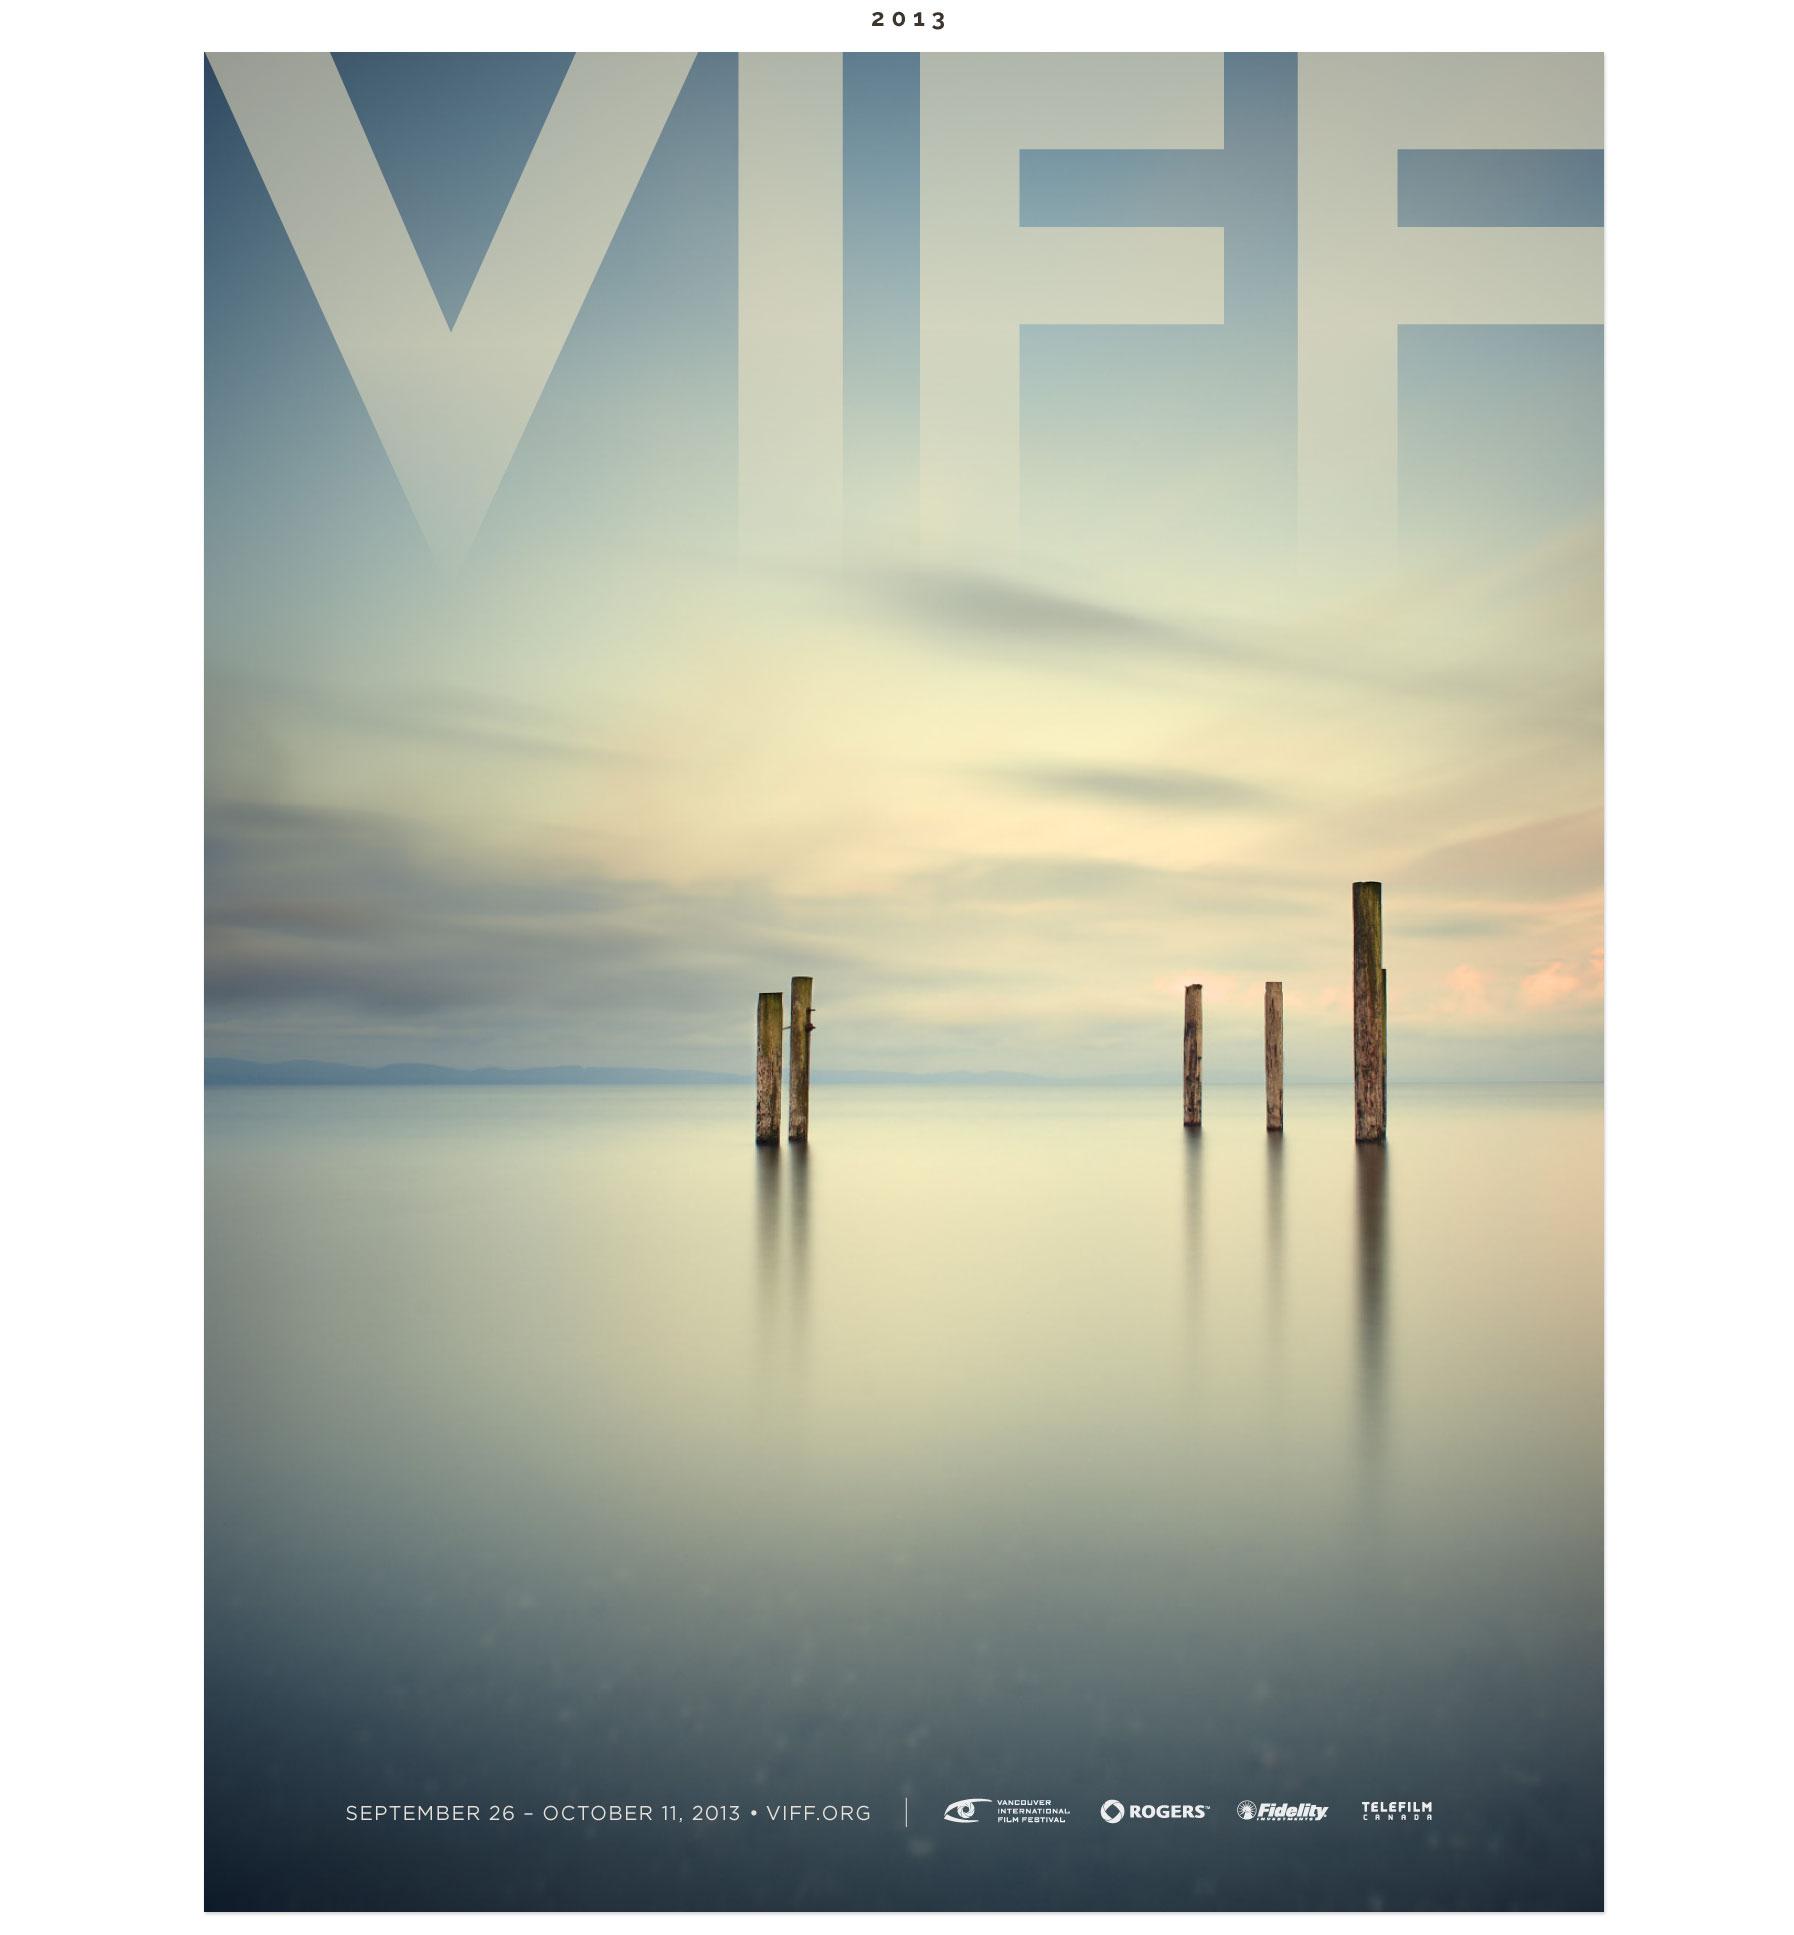 viff_2013